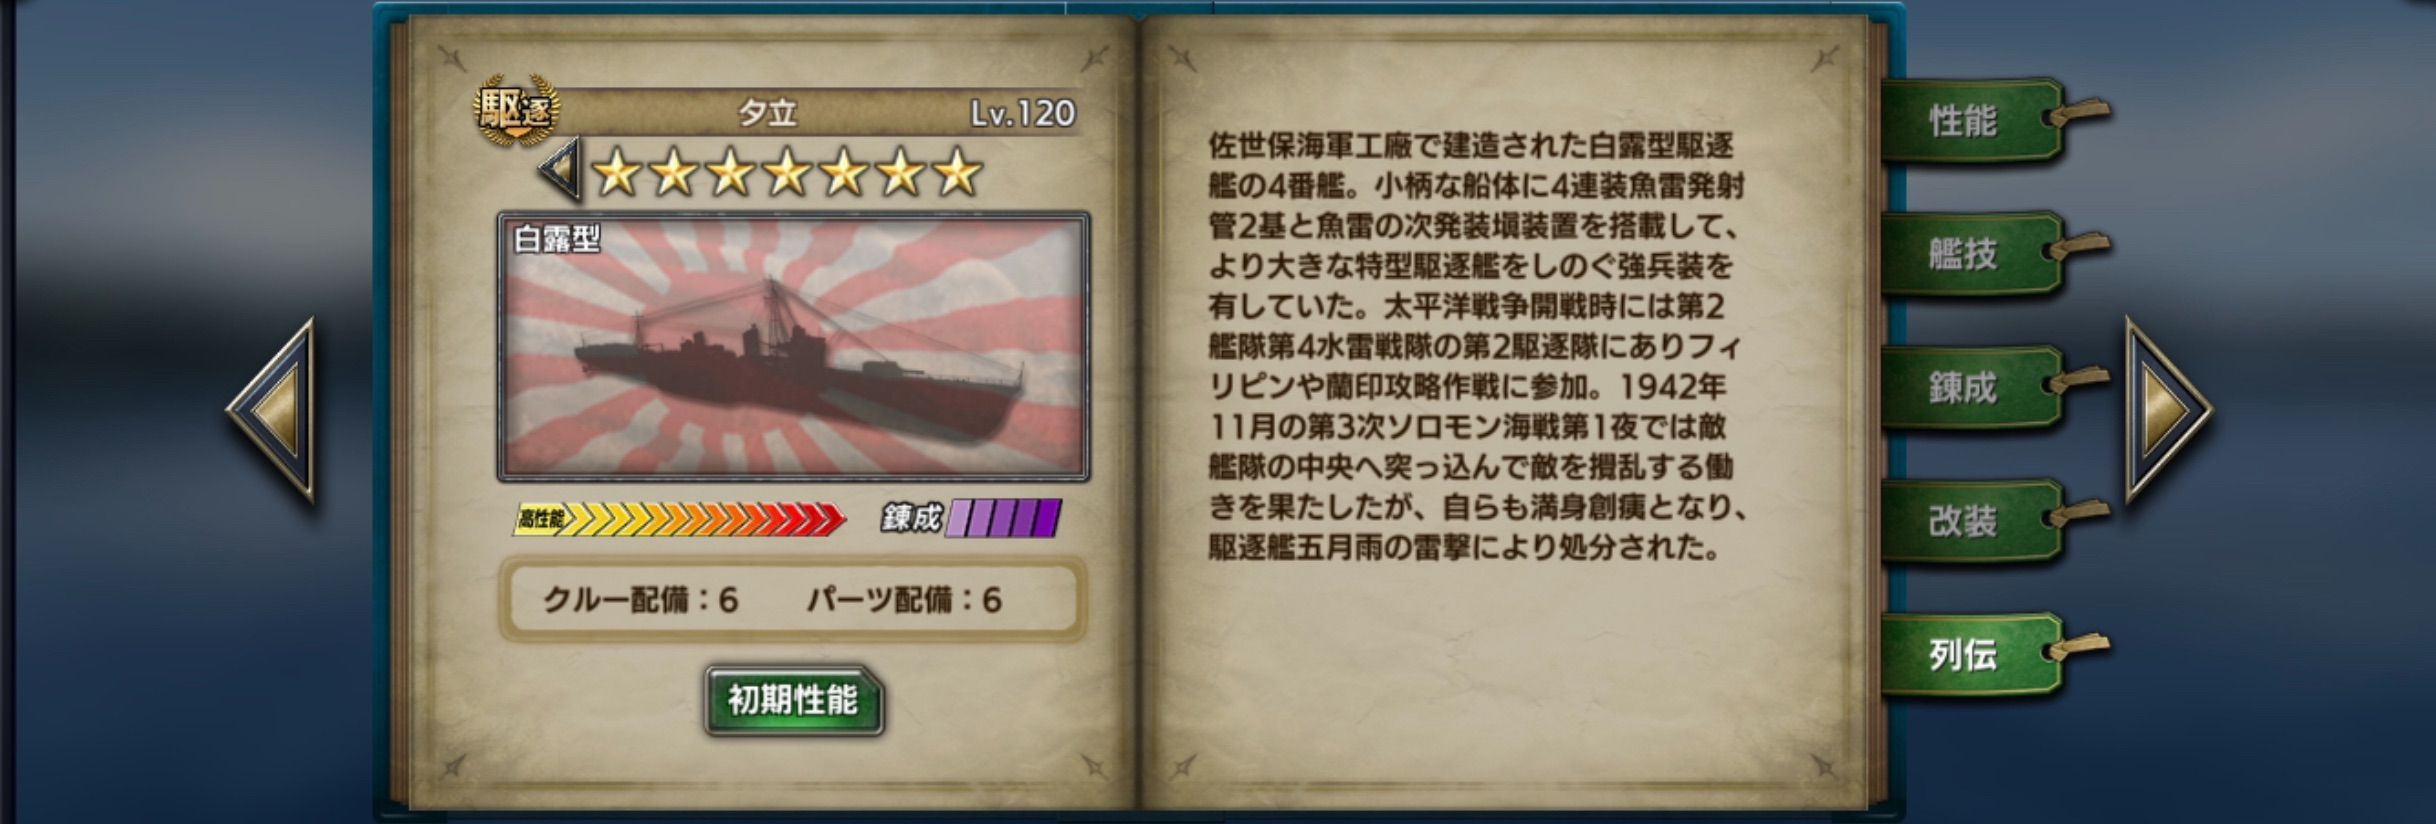 yudachi-history